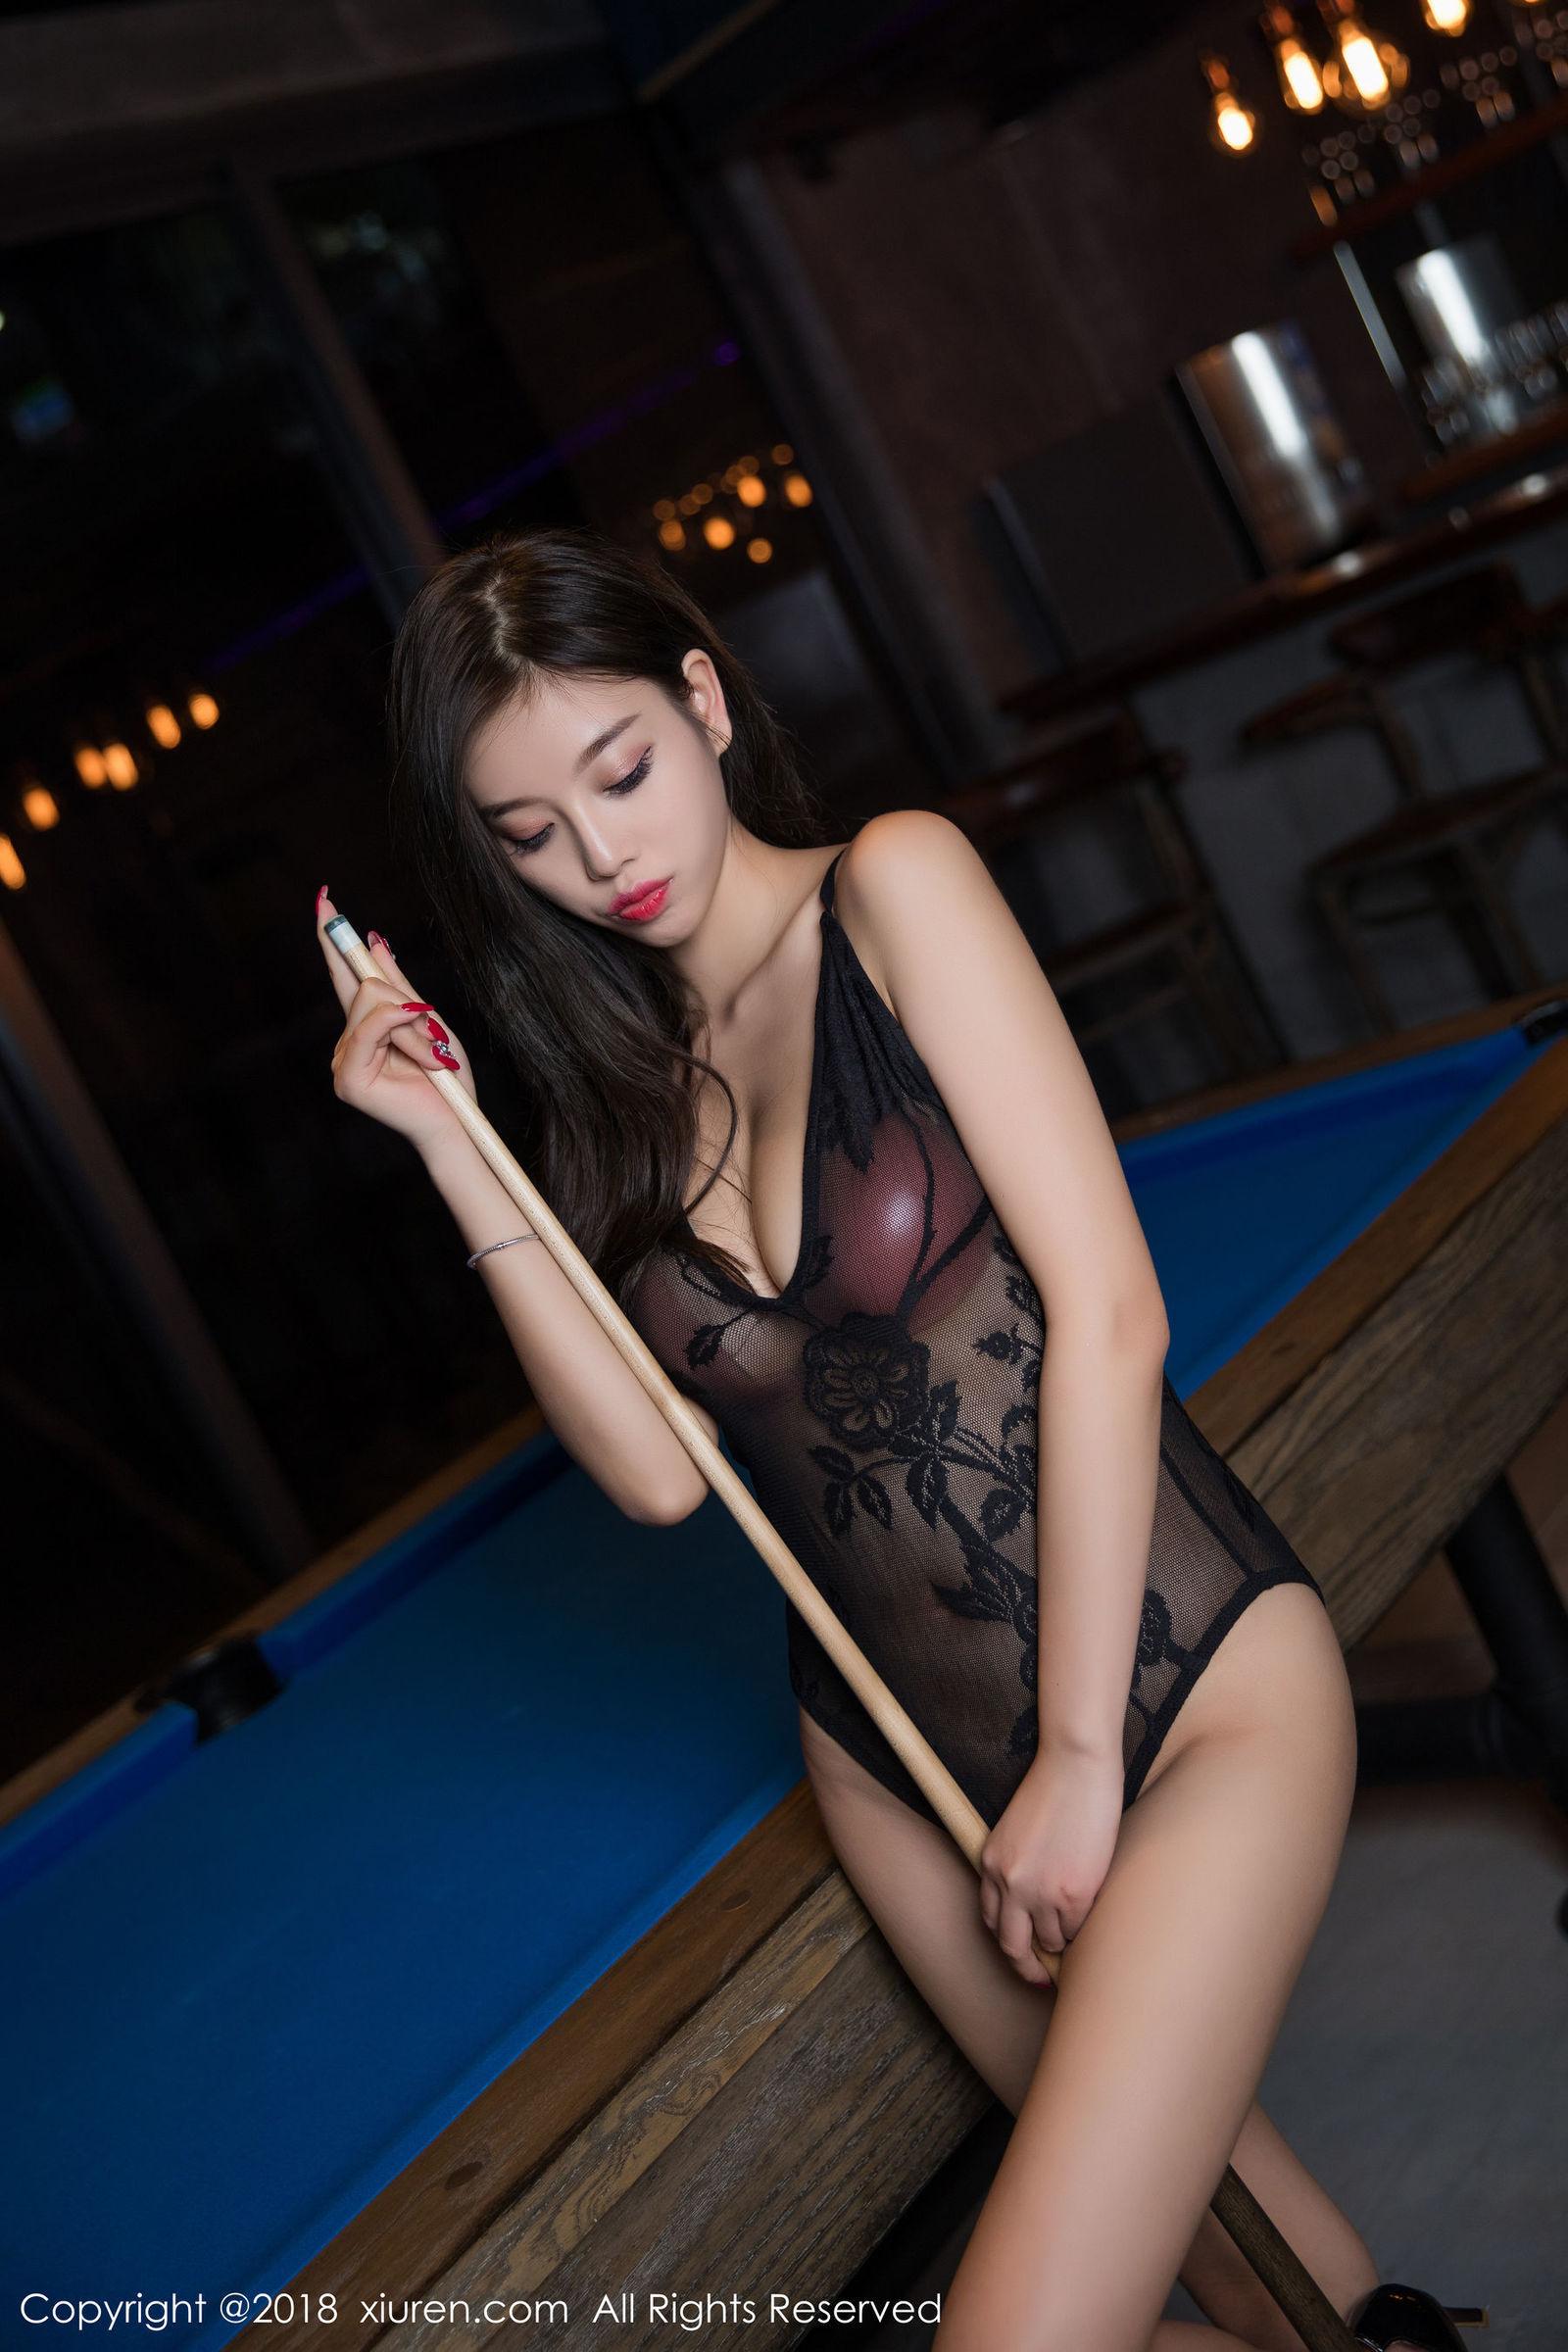 DAYA-007泰国惊艳大胸车模Numnim Jang时而性感时而俏皮